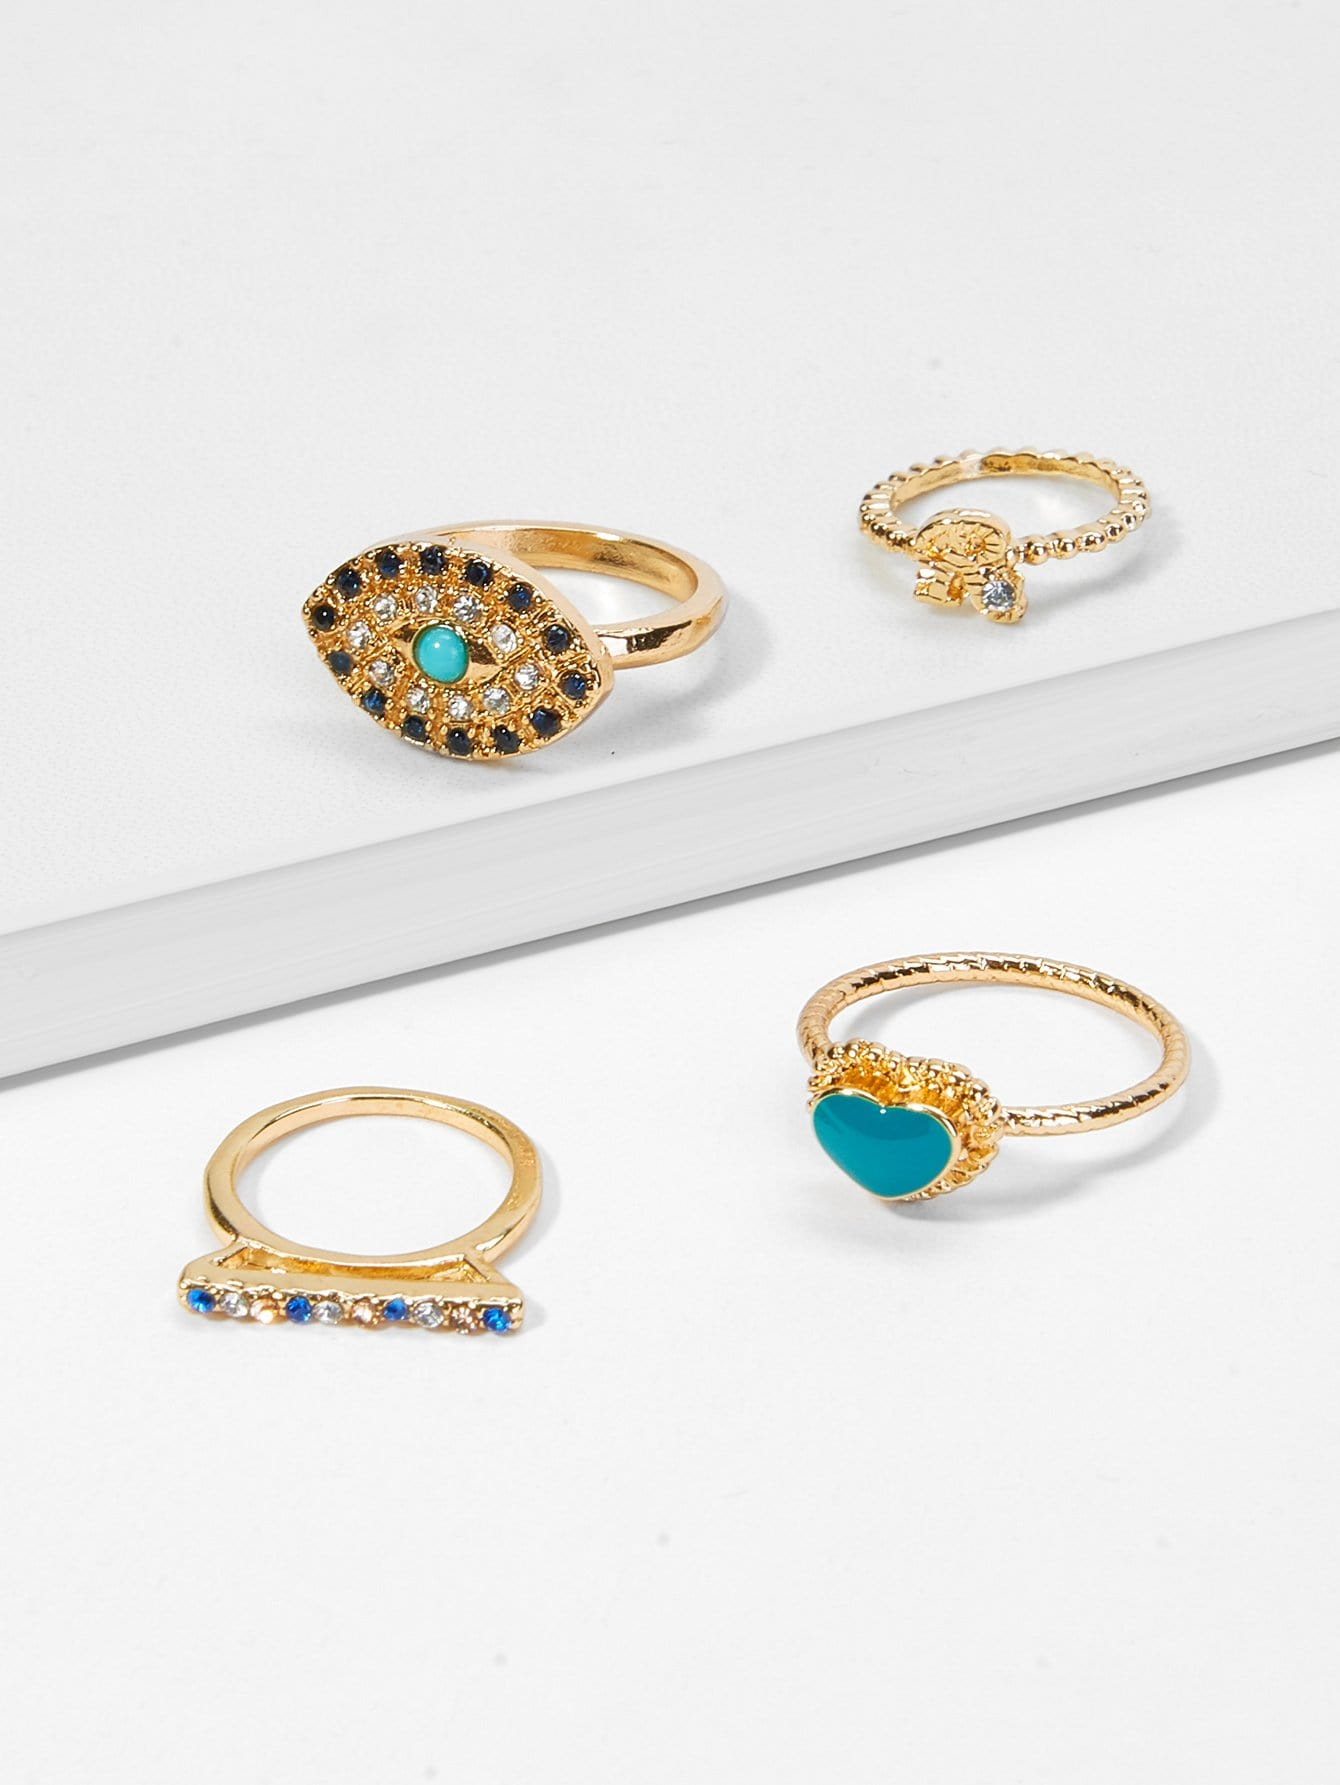 Heart & Eyes Design Rhinestone Rings Set 5pcs 4pcs sweet rhinestone openwork heart design rings for women